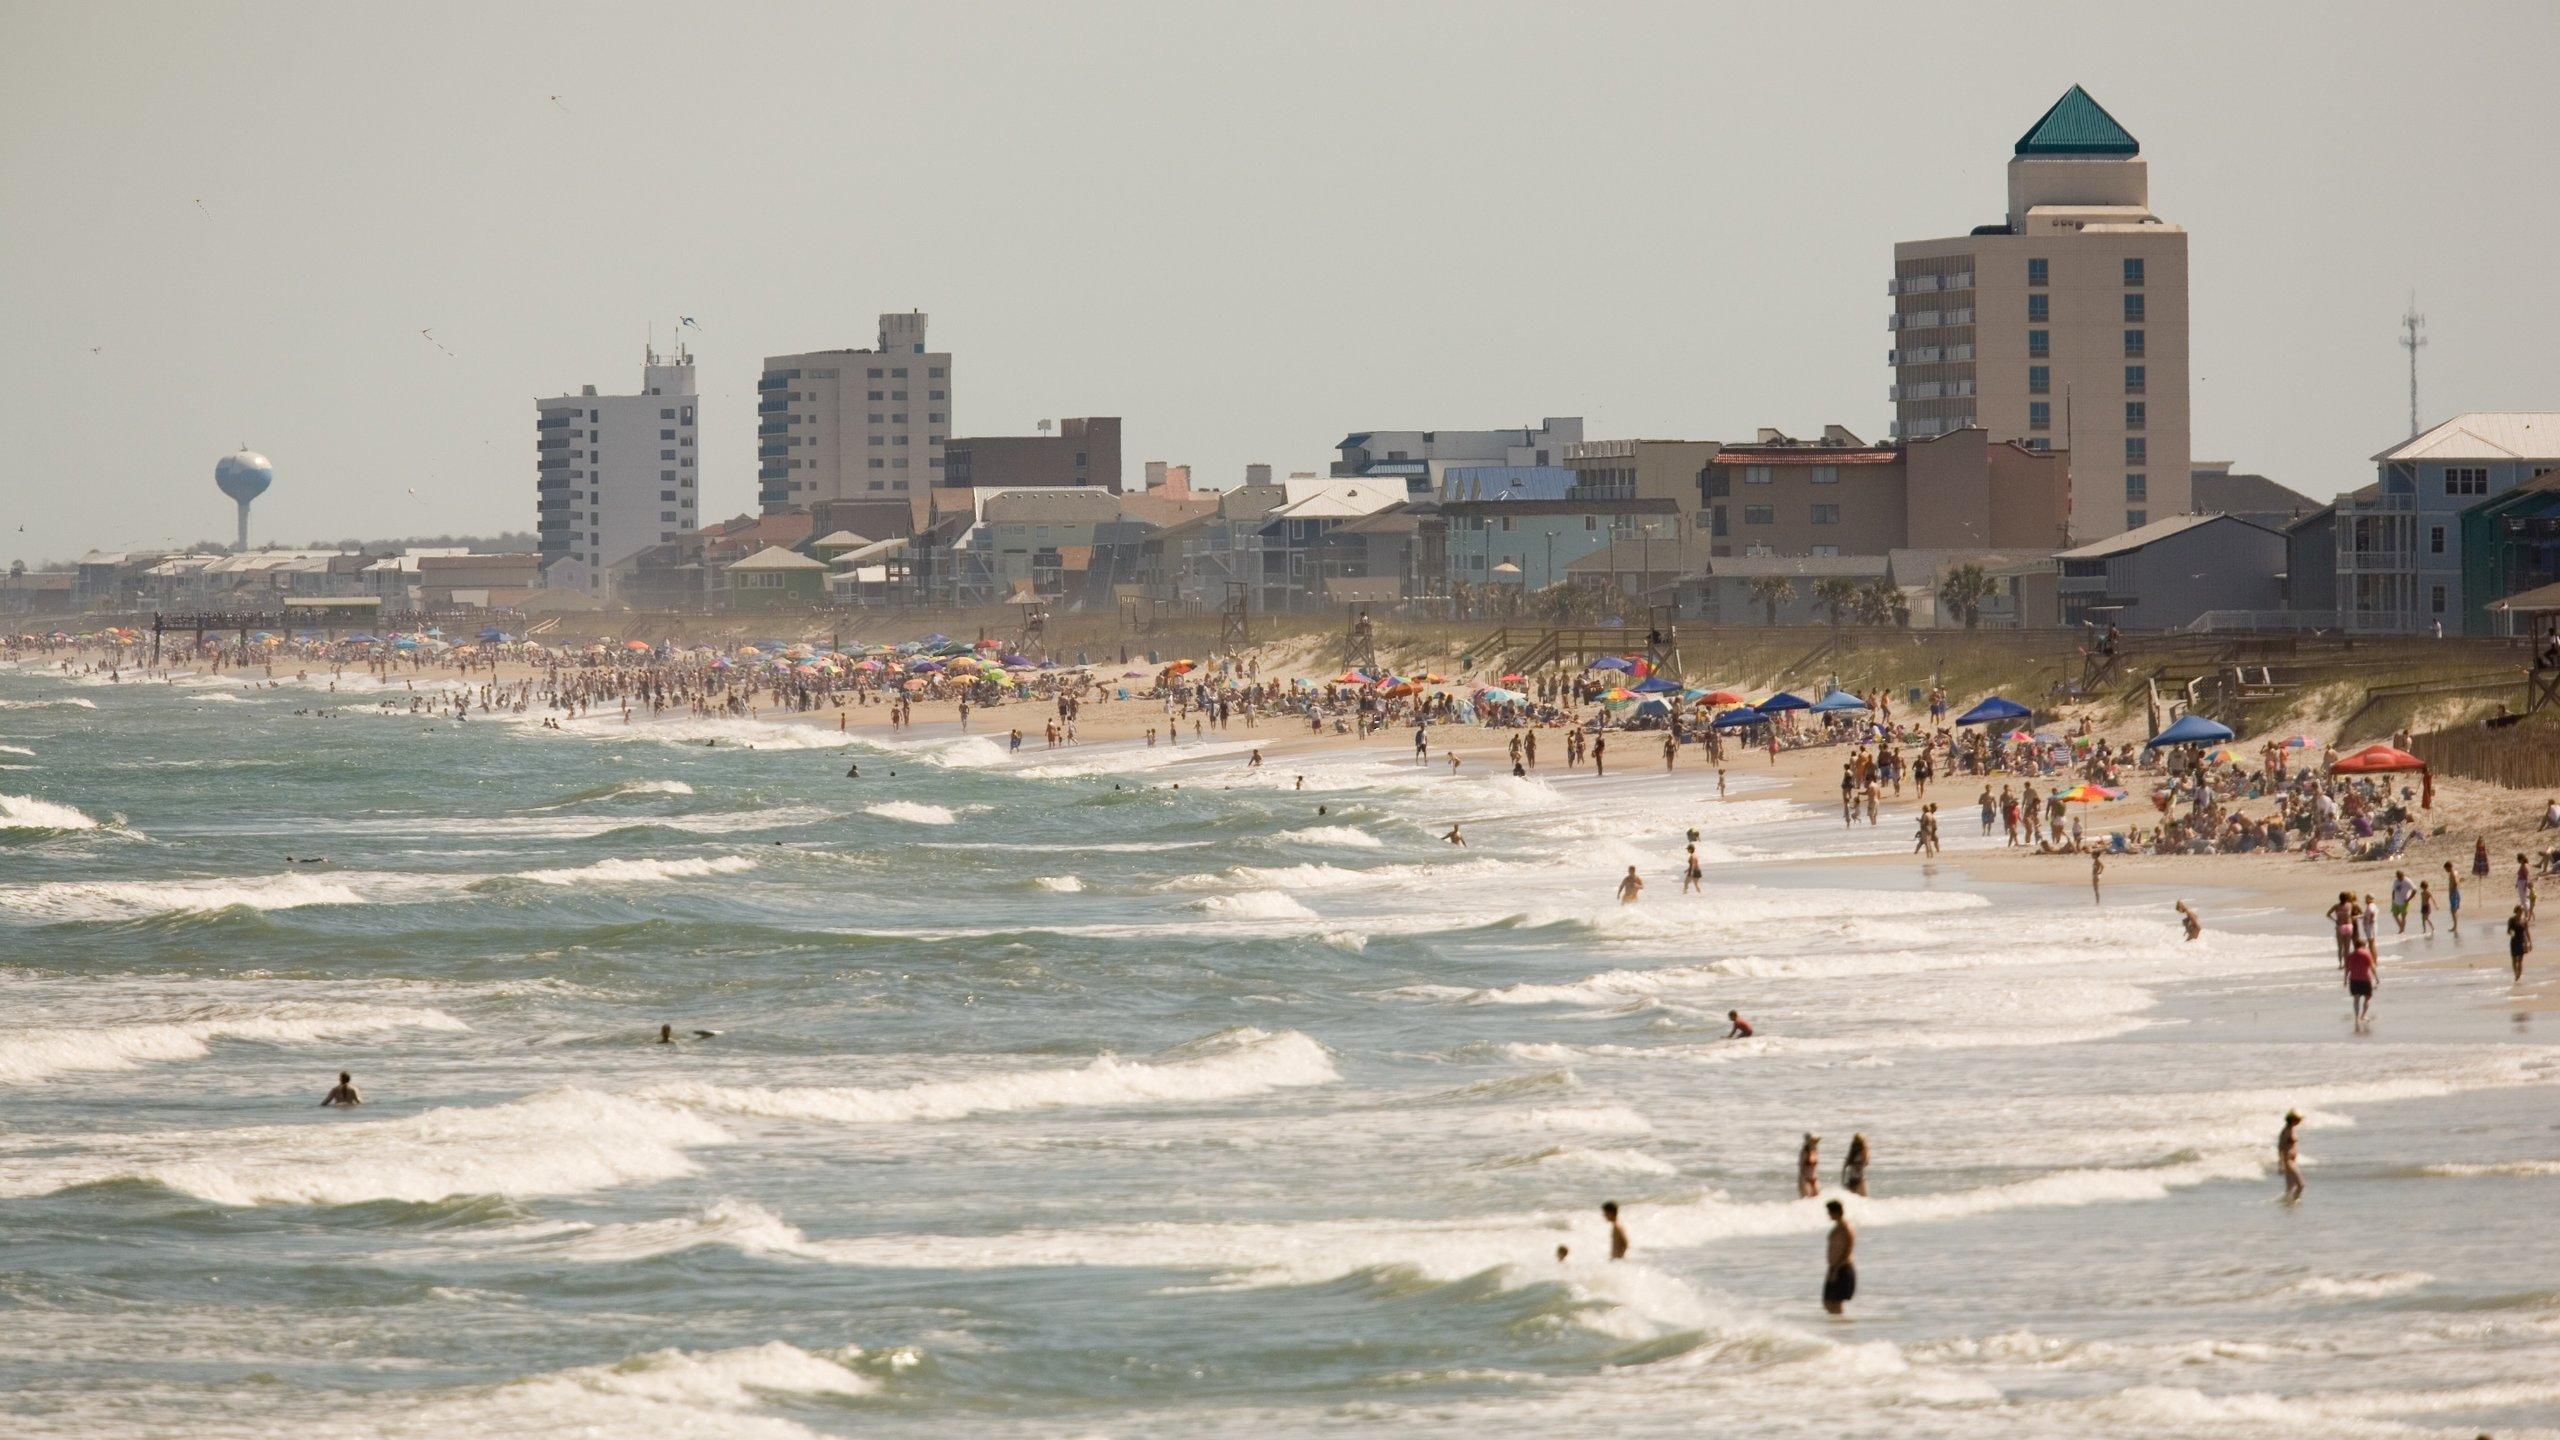 Top 10 Pet Friendly Hotels In Carolina Beach, NC $79: Dog